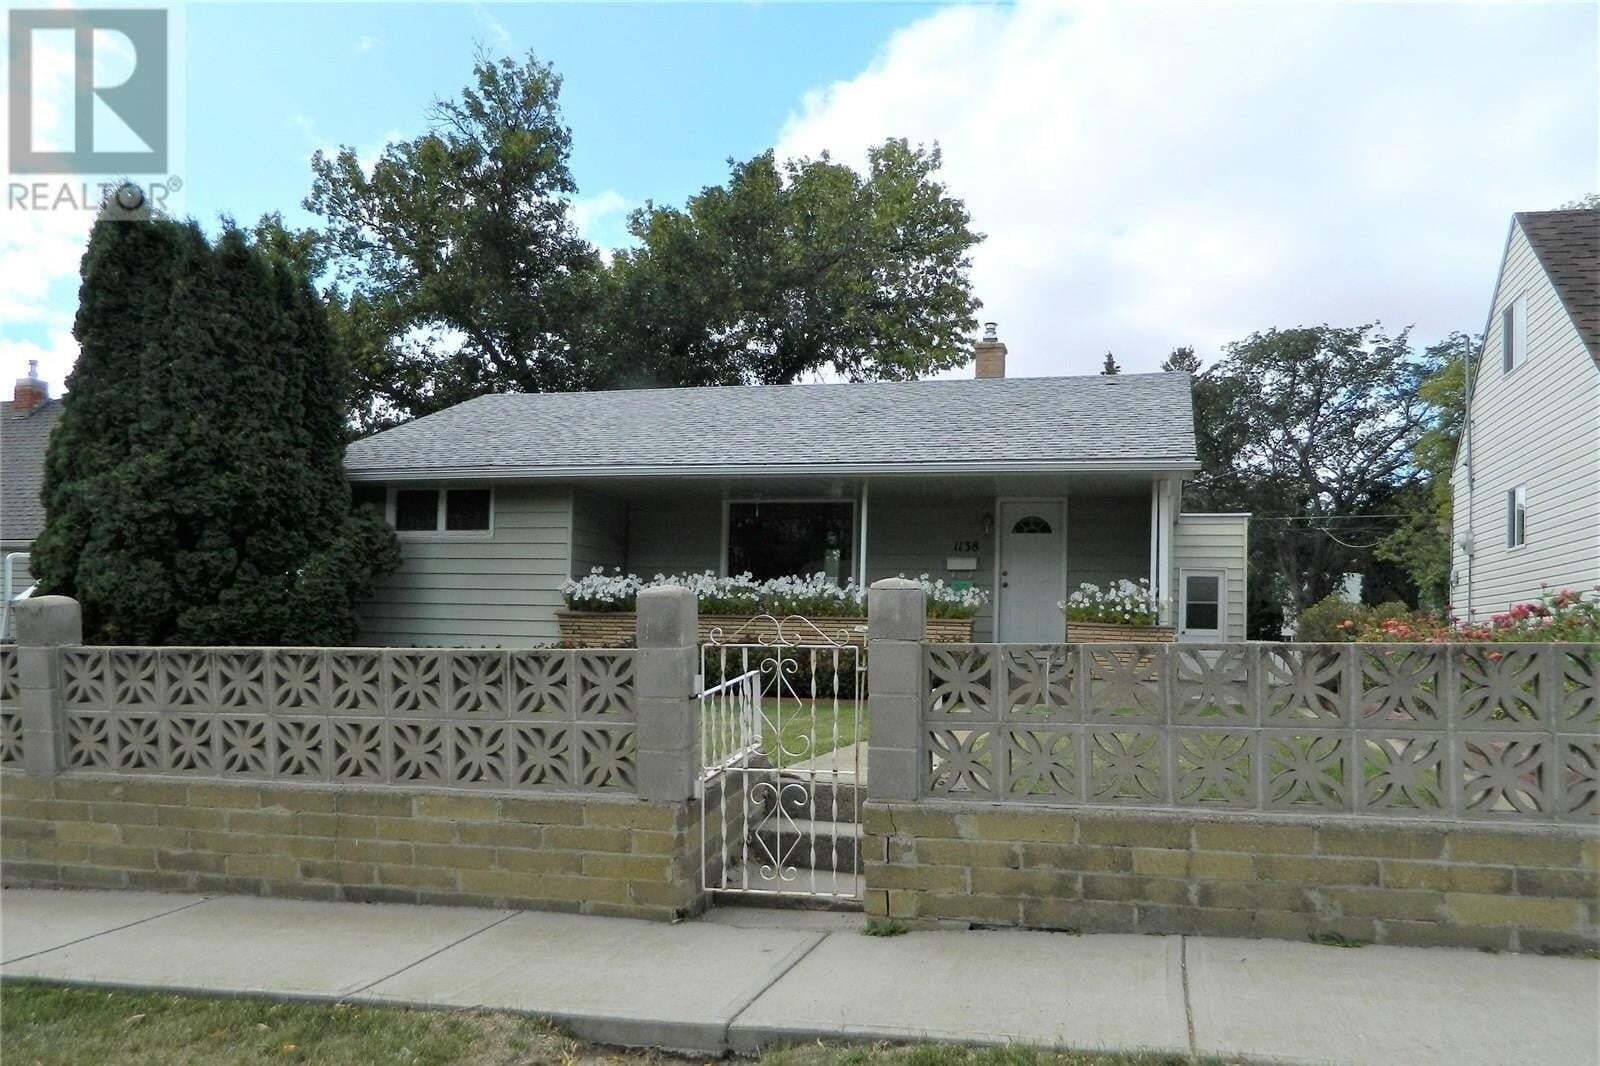 House for sale at 1138 4th Ave NE Moose Jaw Saskatchewan - MLS: SK826178